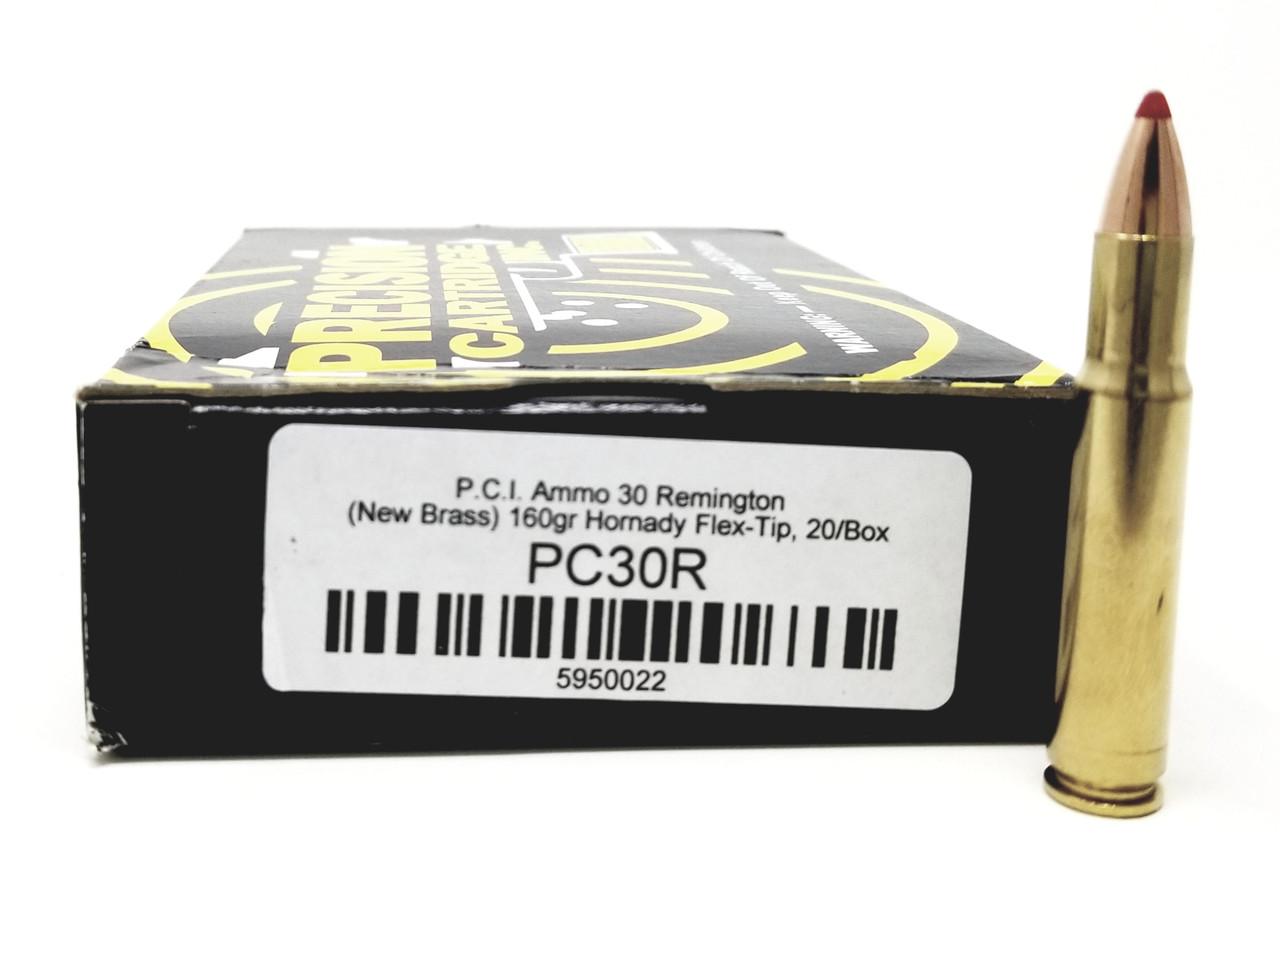 30 Remington Ammo